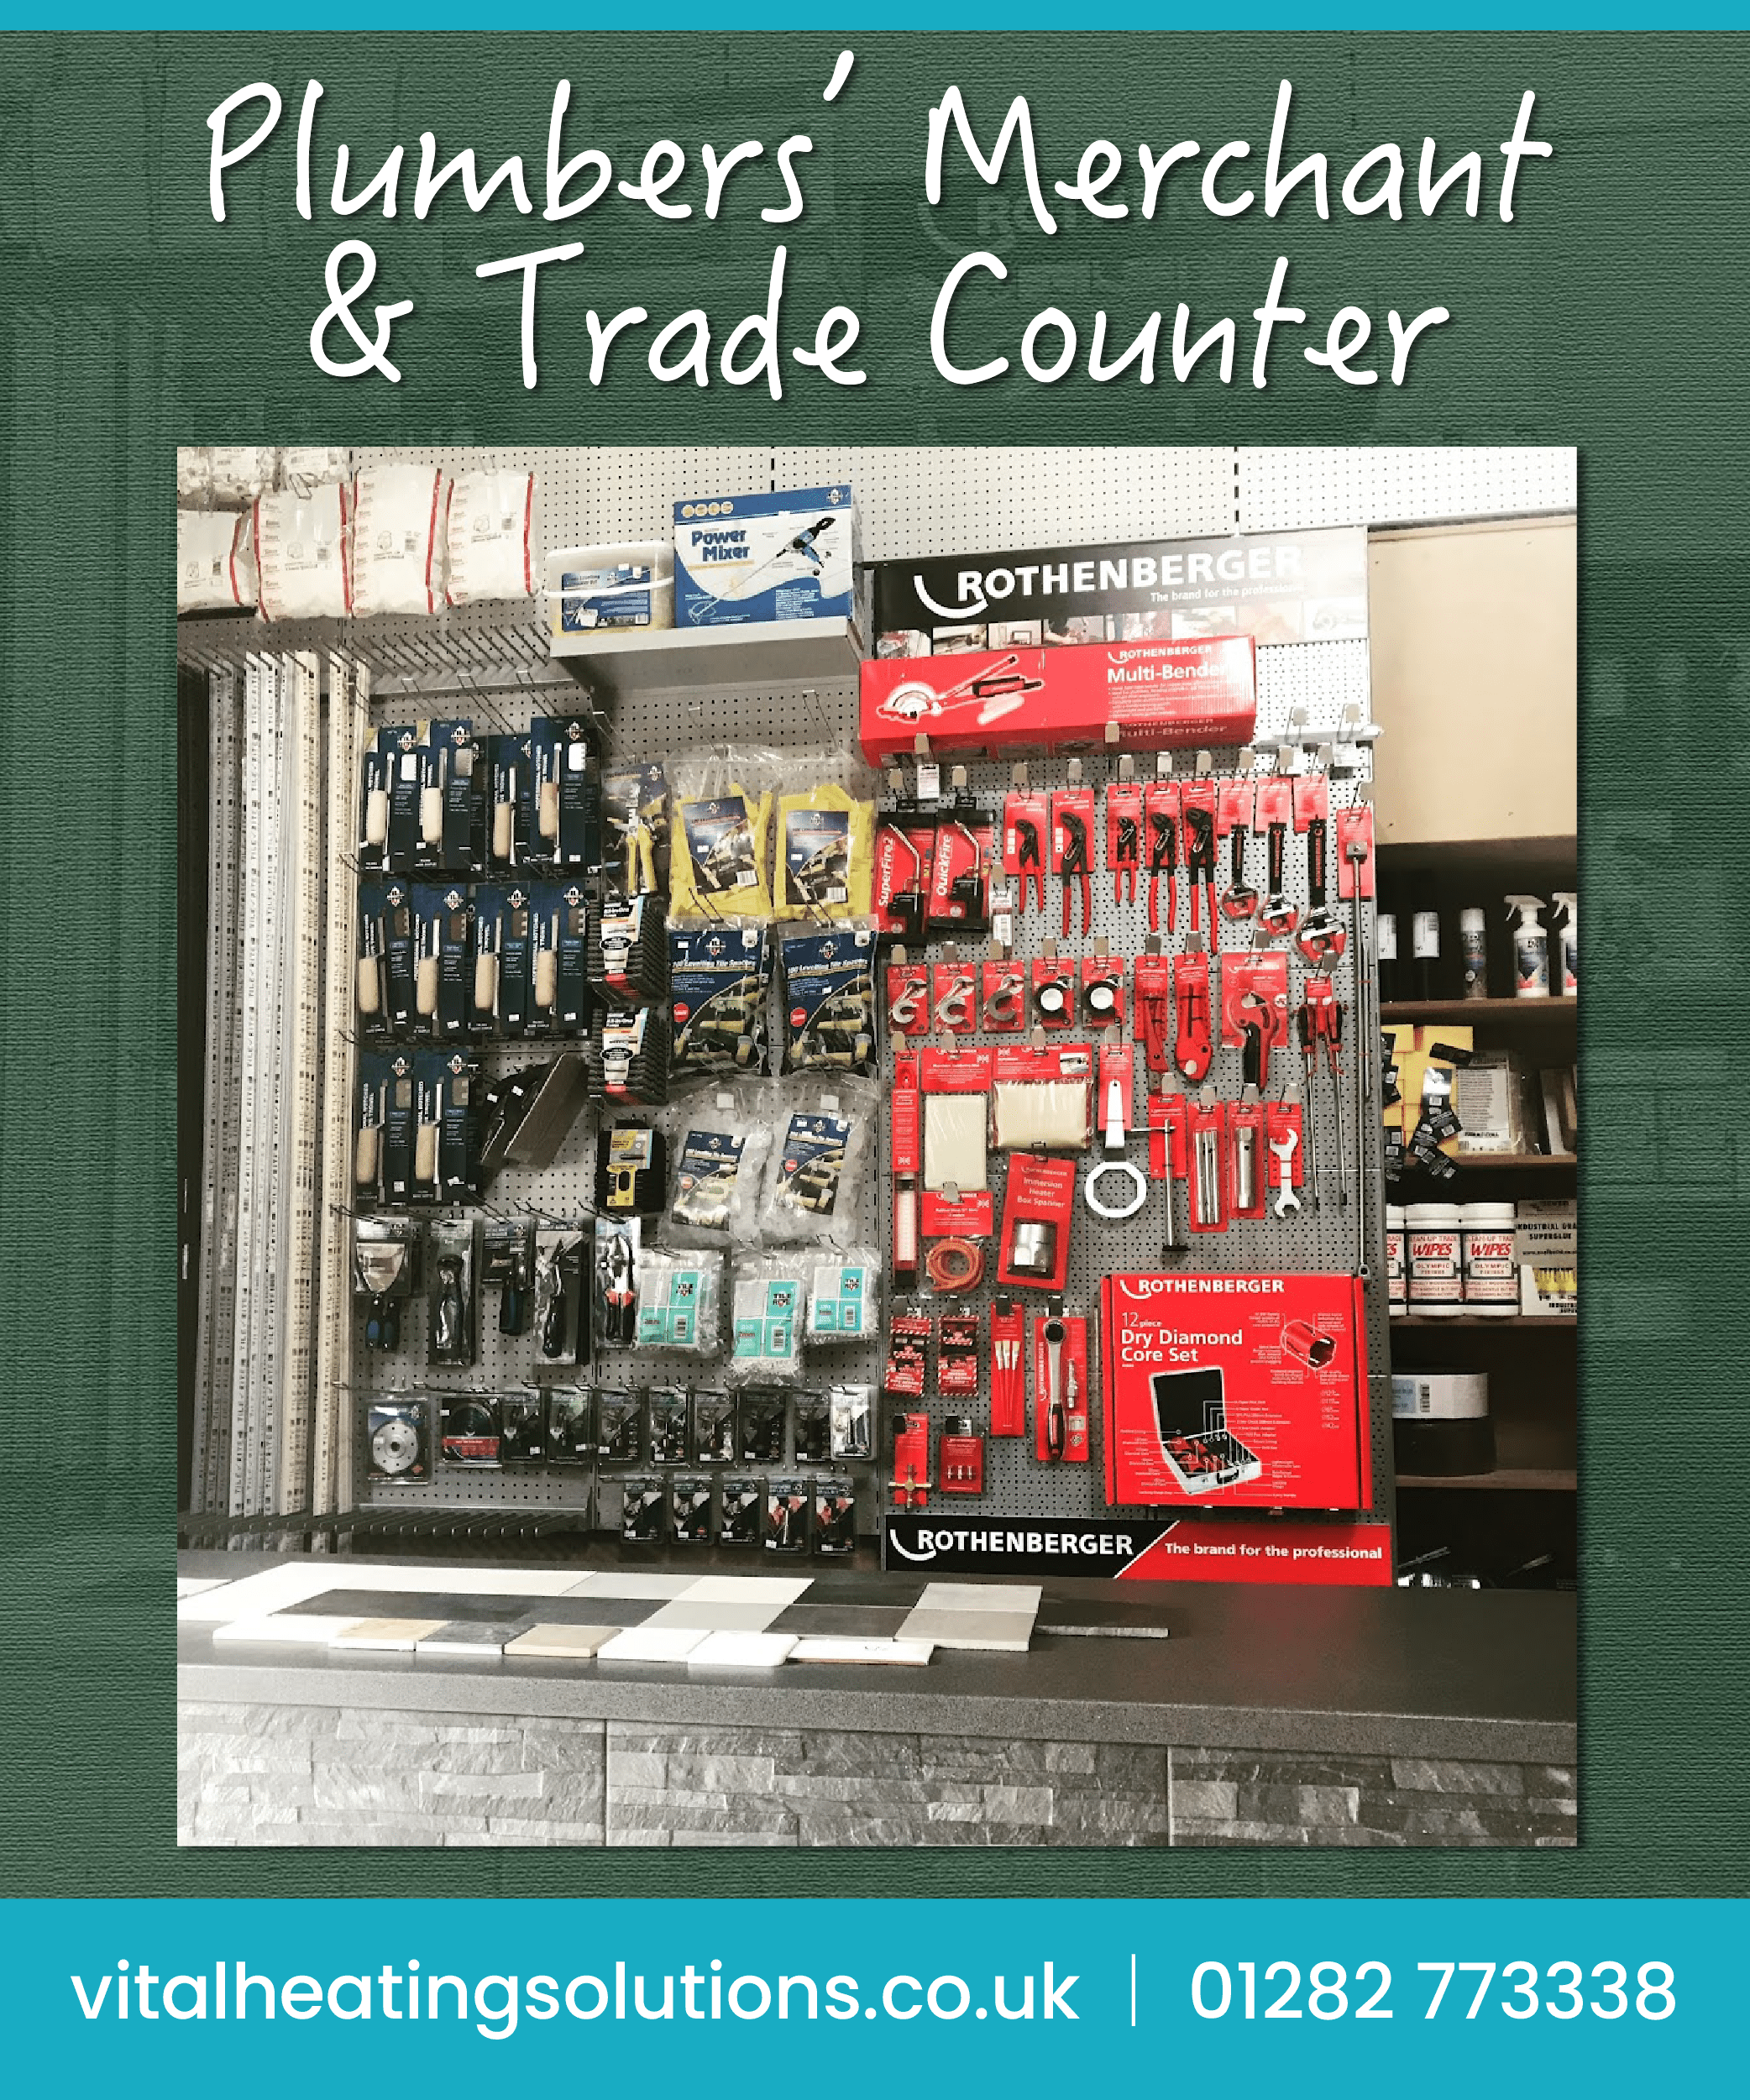 Plumbers Merchant Shop Lancashire Burnley Blackburn UK Trade Counter